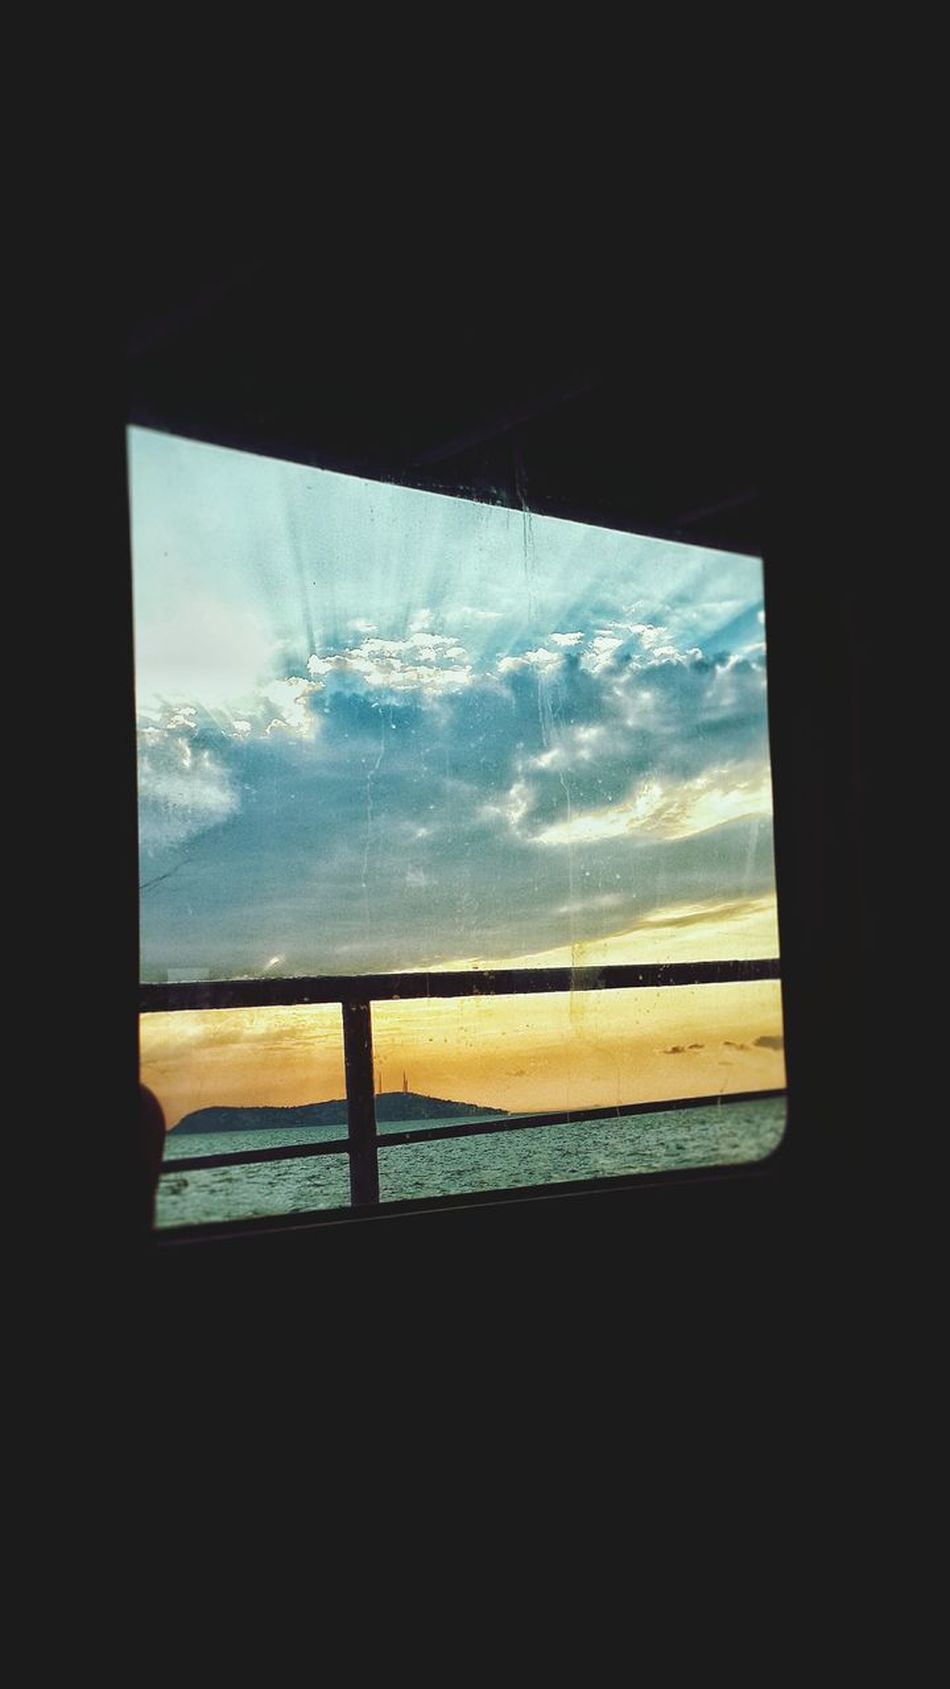 Vapur Ve İstanbul Adalar Vapuru Adalarmanzara 😊😊 Adalarmanzara Akşam Güneşi sunset #sun #clouds #skylovers #sky #nature #beautifulinnature #naturalbeauty photography landscape No People Window Sea Sky Cloud - Sky Nature